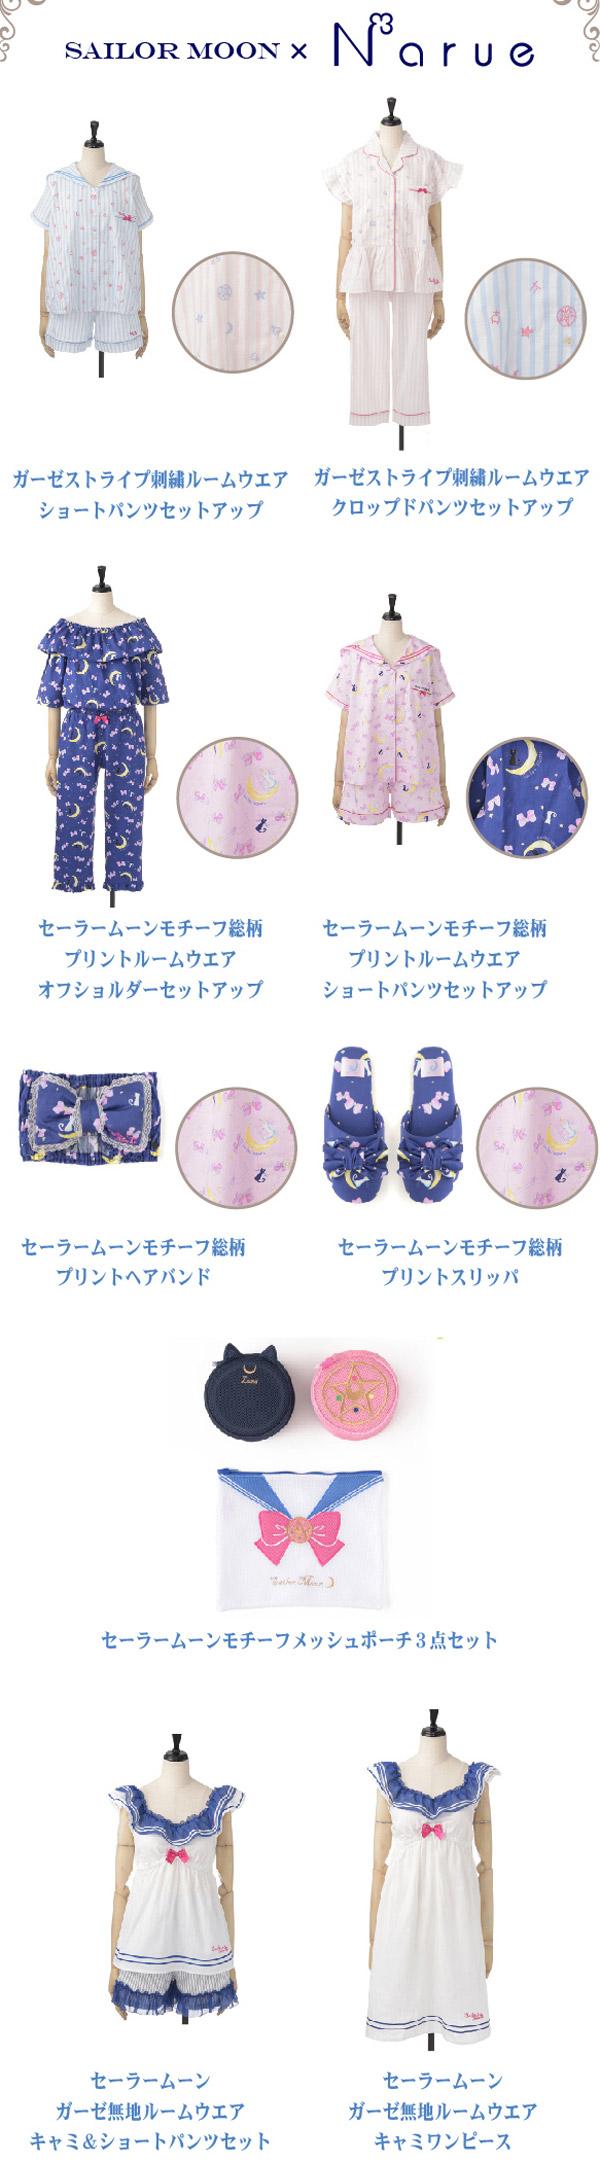 sailormoon-narue-pajamas-room-wear-collaboration-isetan-fashion2016